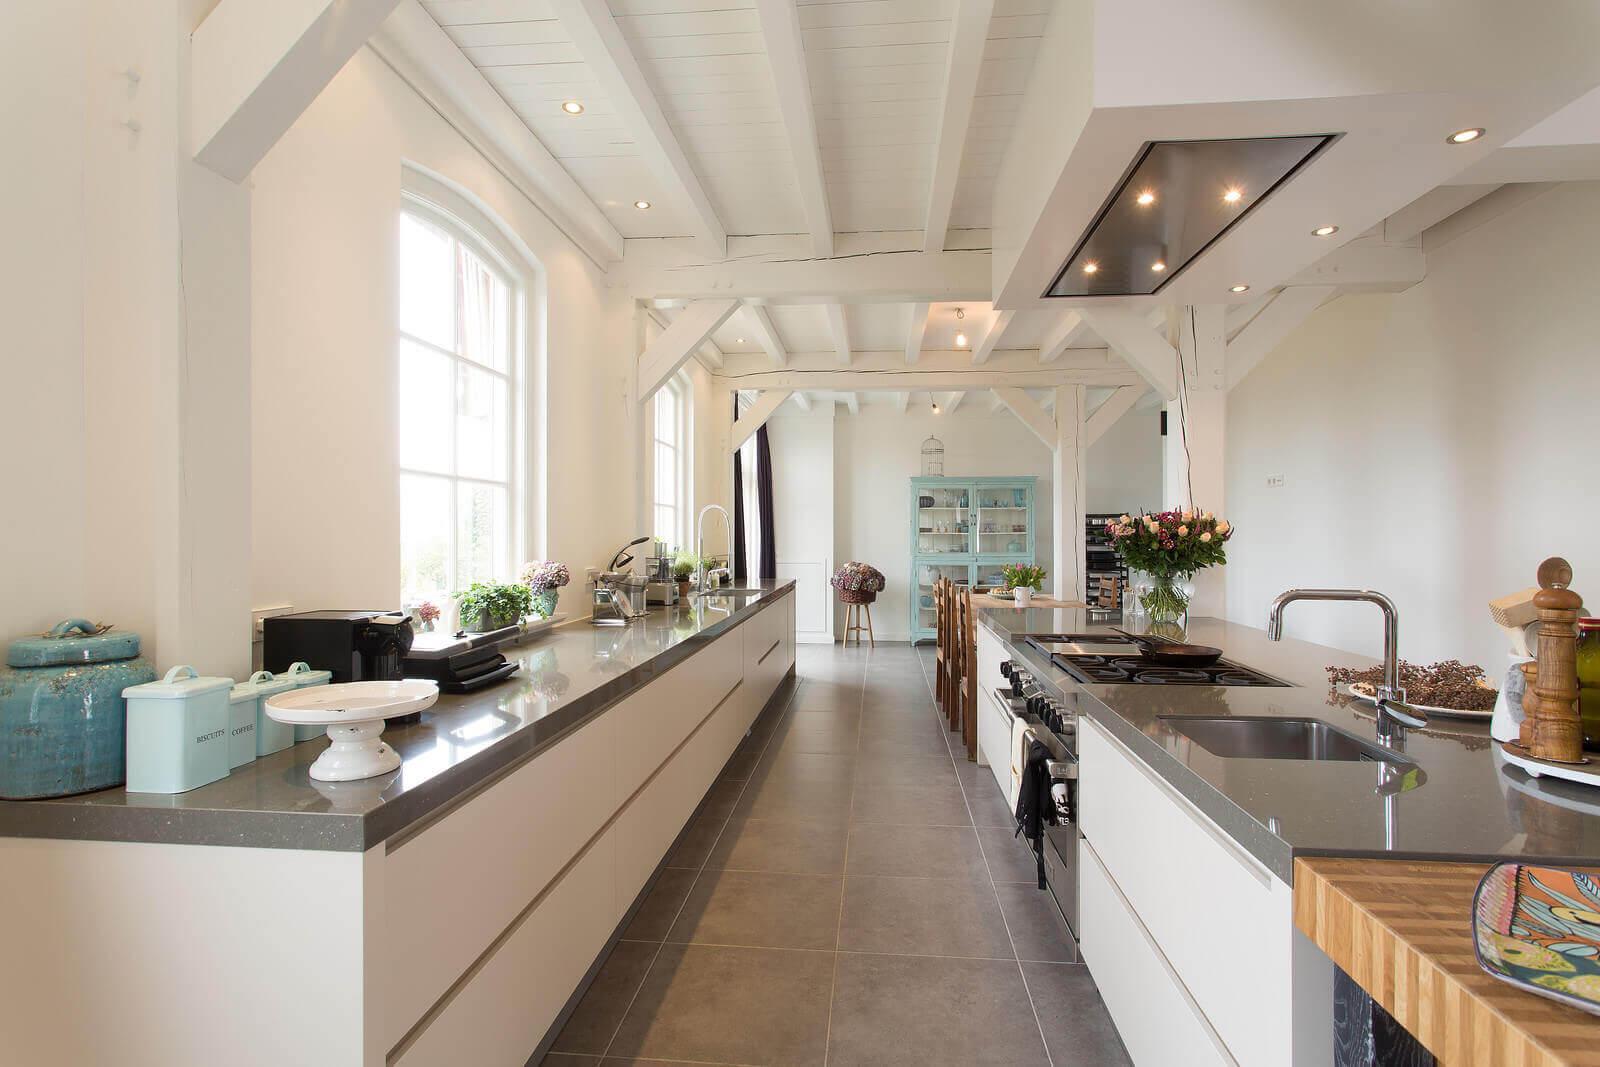 Prachtige witte keukens